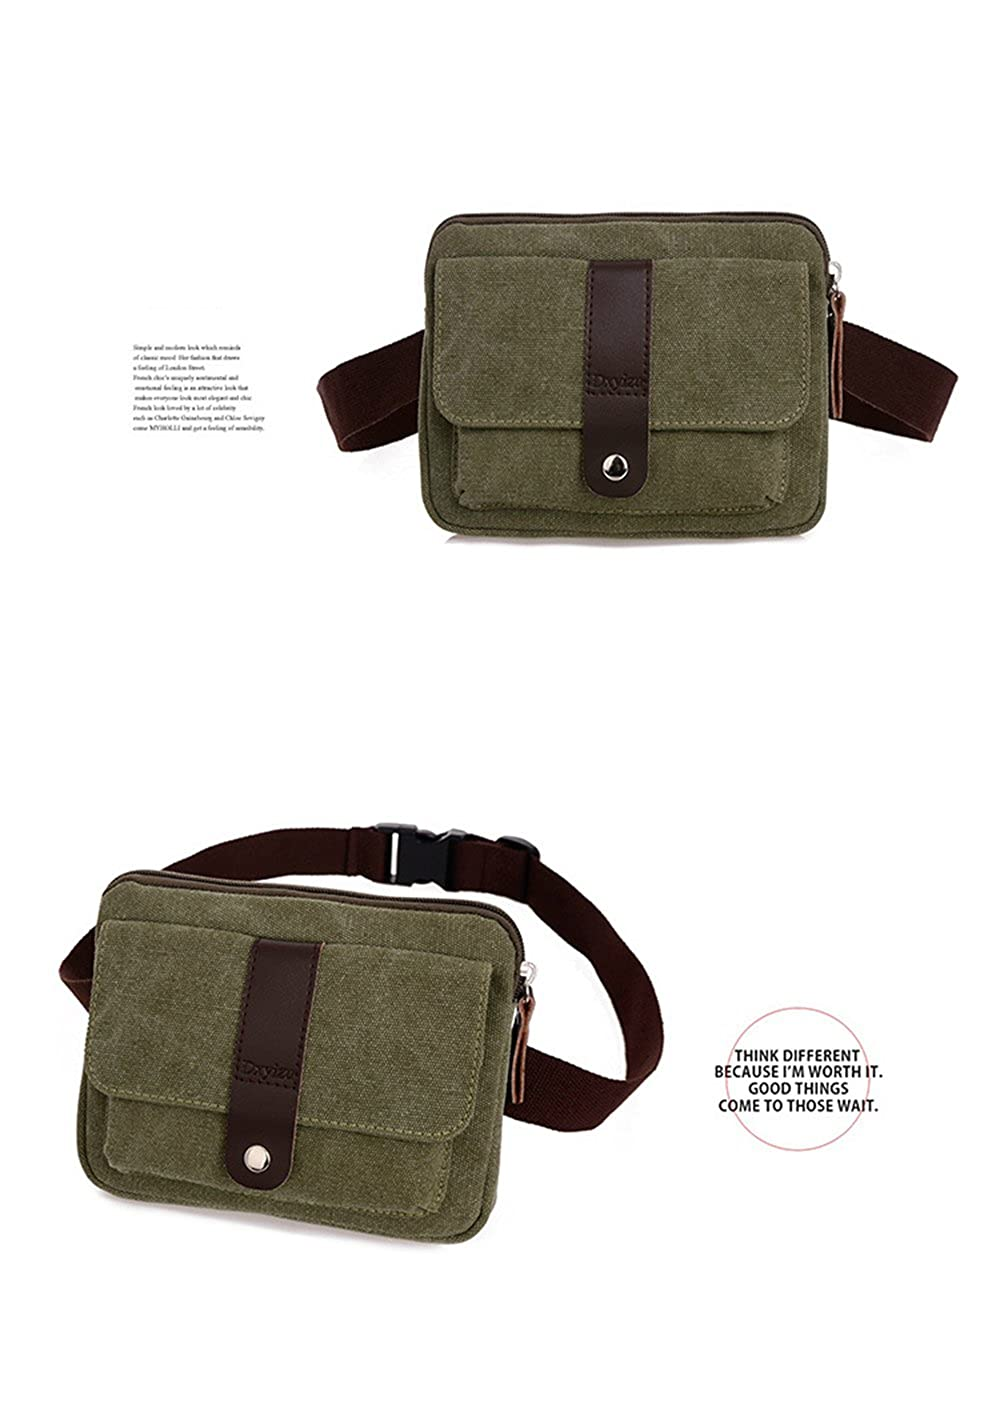 32bc5987a67c Amazon.com: Daosen Small Canvas Multiple Pocket Adjustable Fanny Pack  Travel Waist Bag Hip Purse Belt Bag Bum Bag Army Green: Sports & Outdoors